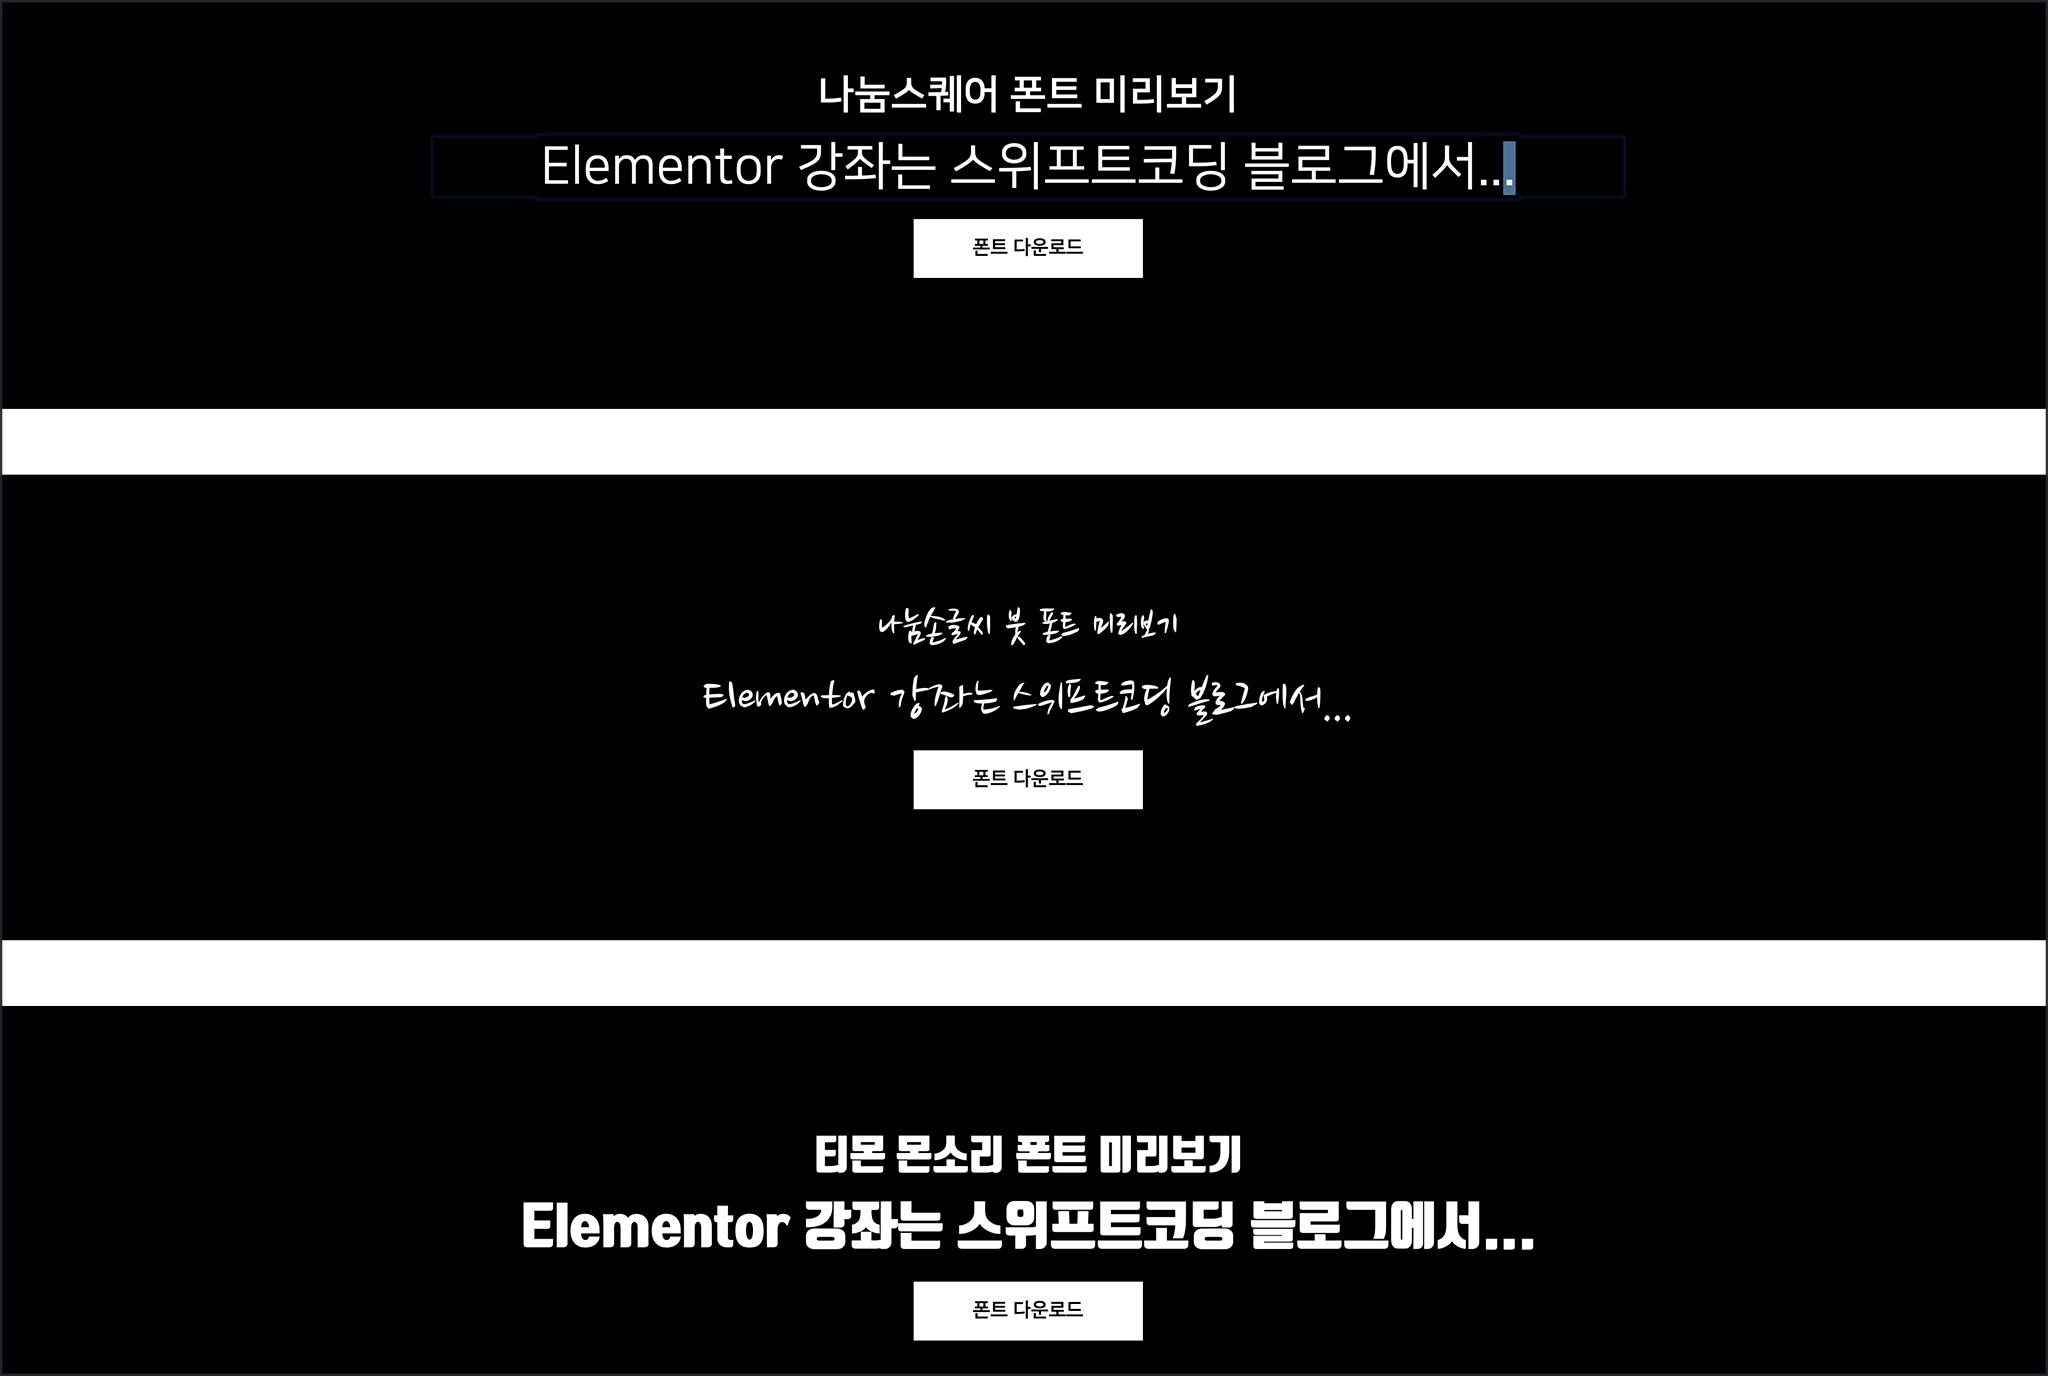 Elementor 강좌는 스위프트코딩 블로그에서... 라는 글자로 바꿈